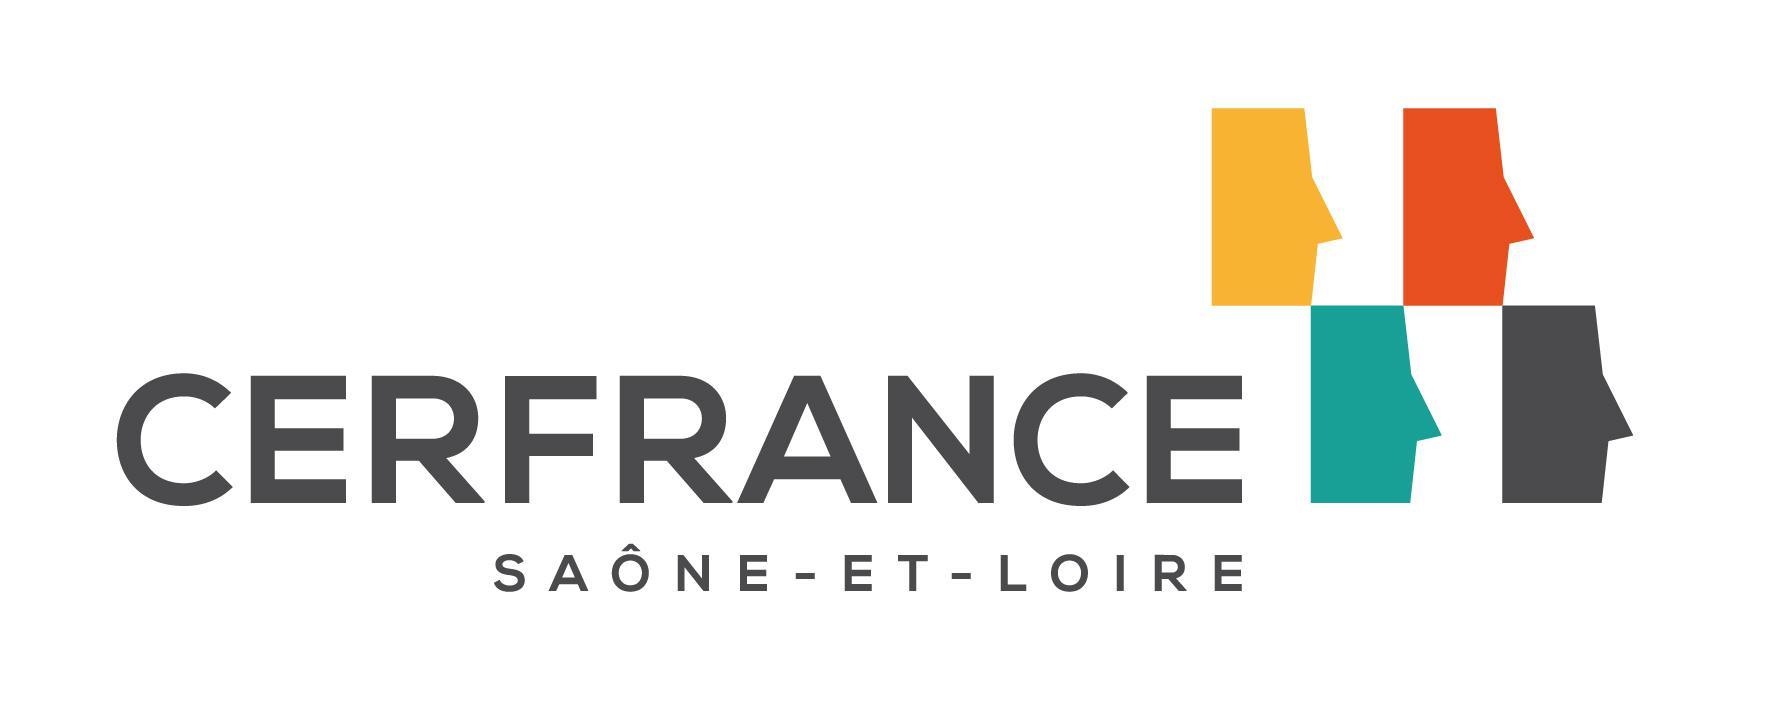 CERFRANCE Saône et Loire expert-comptable